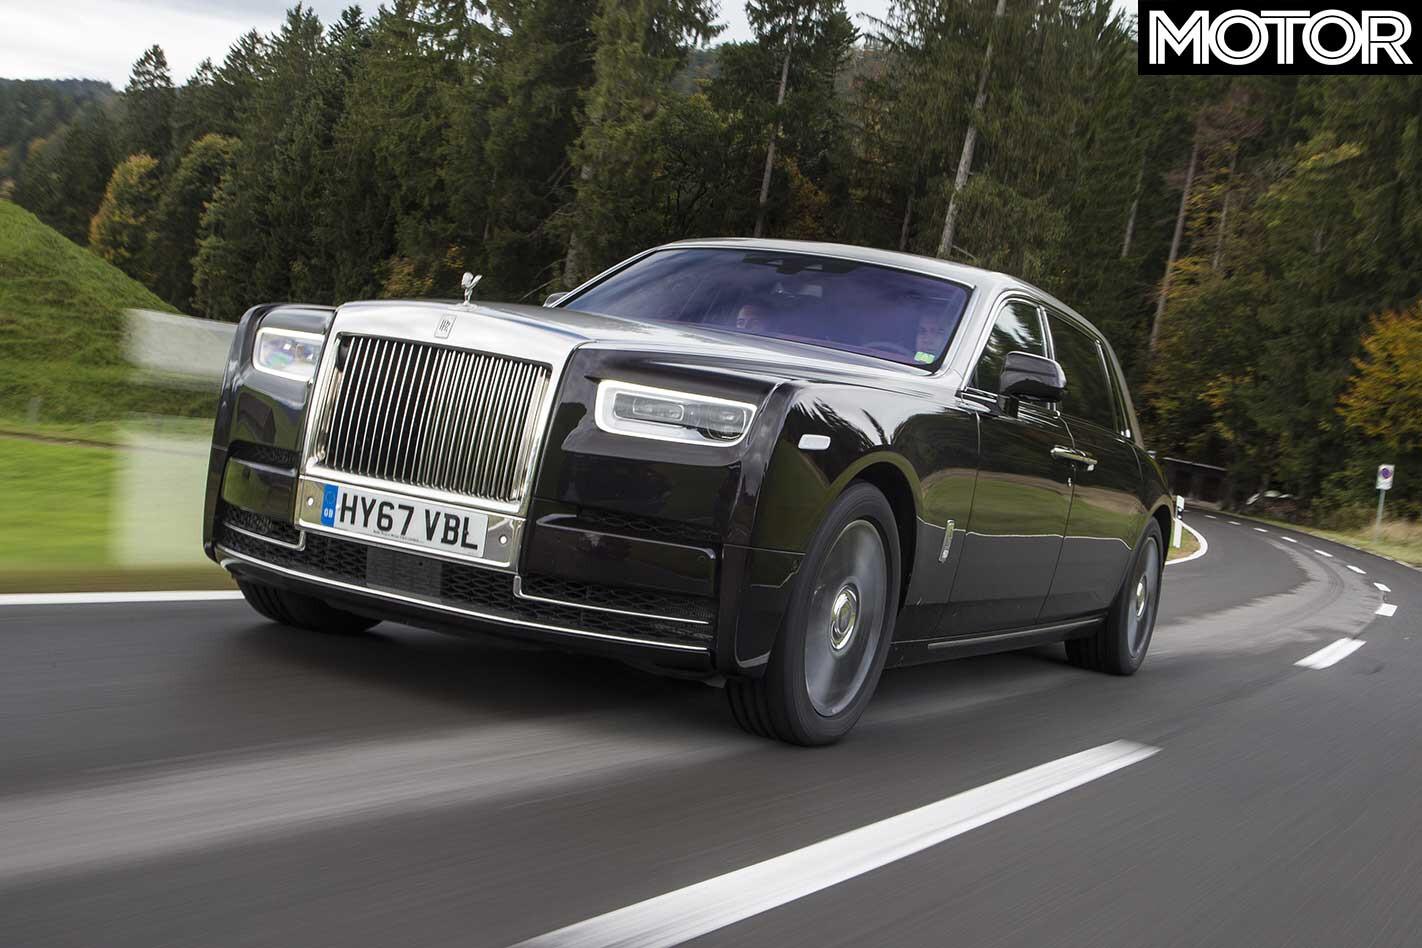 Rolls Royce Phantom Ewb Jpg